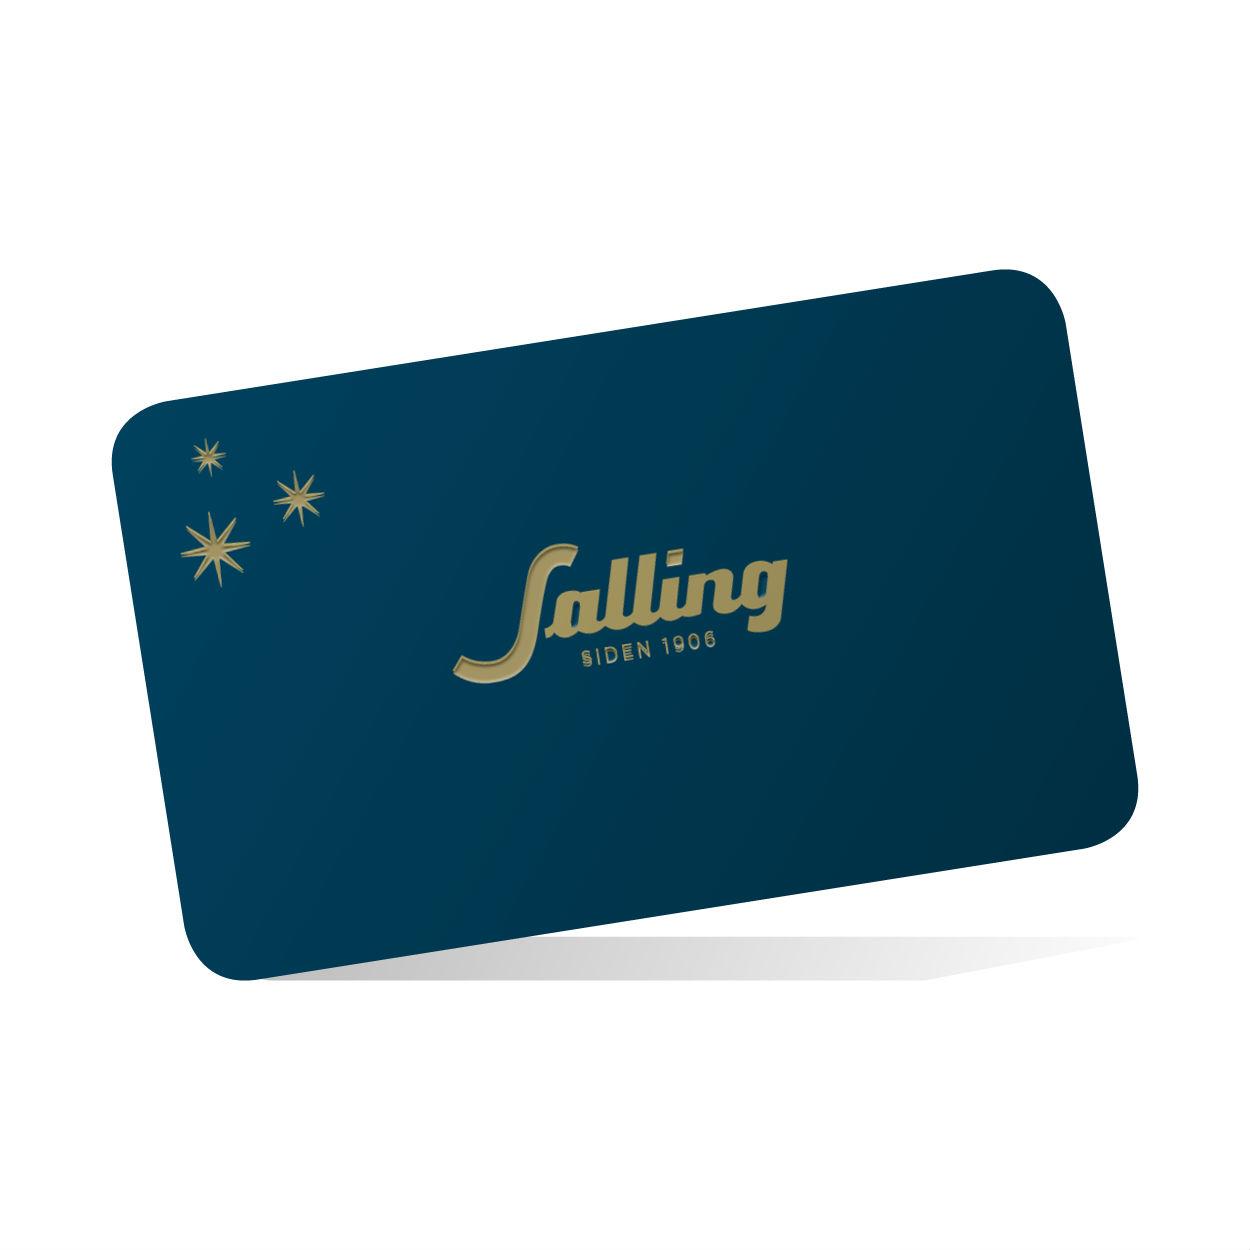 Salling gavekort - 600 kr